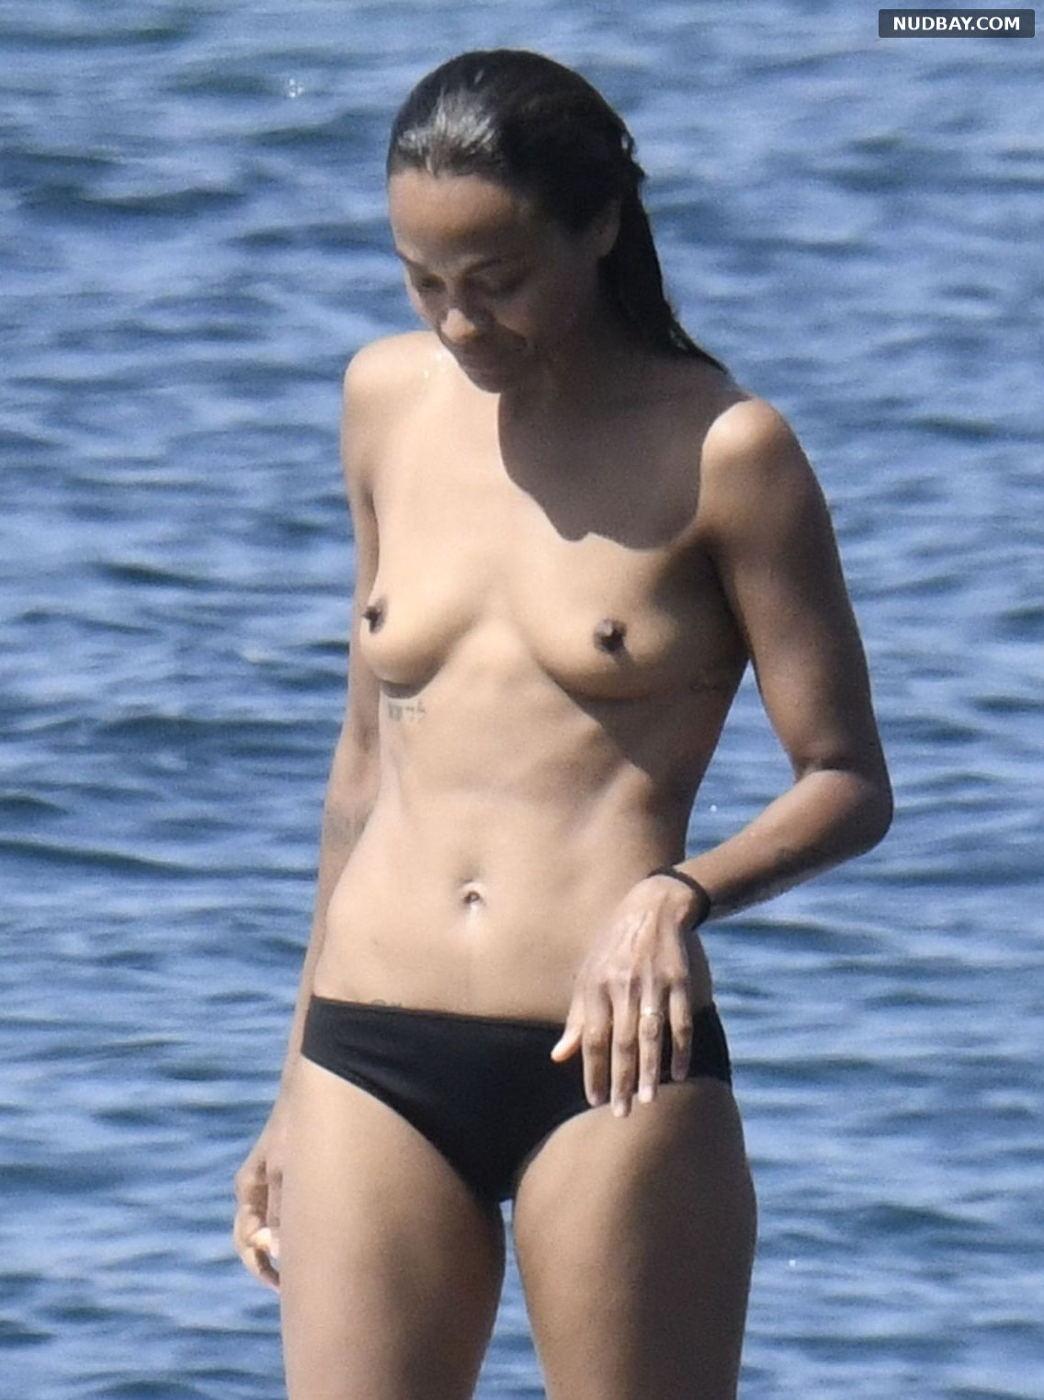 Zoe Saldana topless on a boat in Italy Aug 17 2021